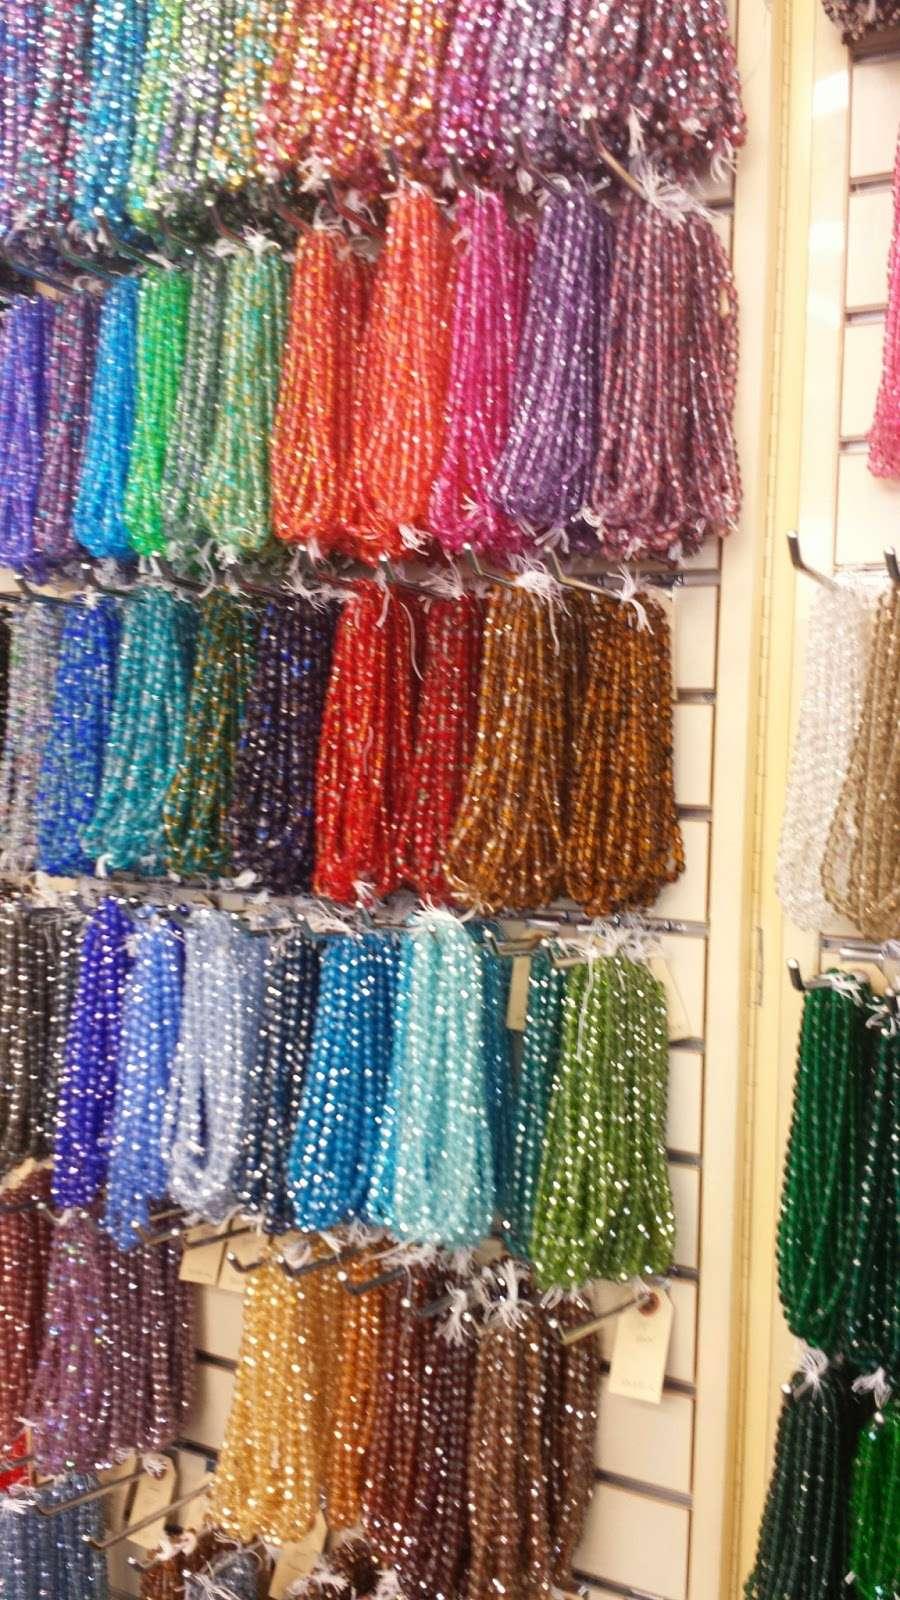 Margola Import Corporation - store  | Photo 3 of 4 | Address: 232 S Van Brunt St, Englewood, NJ 07631, USA | Phone: (201) 816-9500